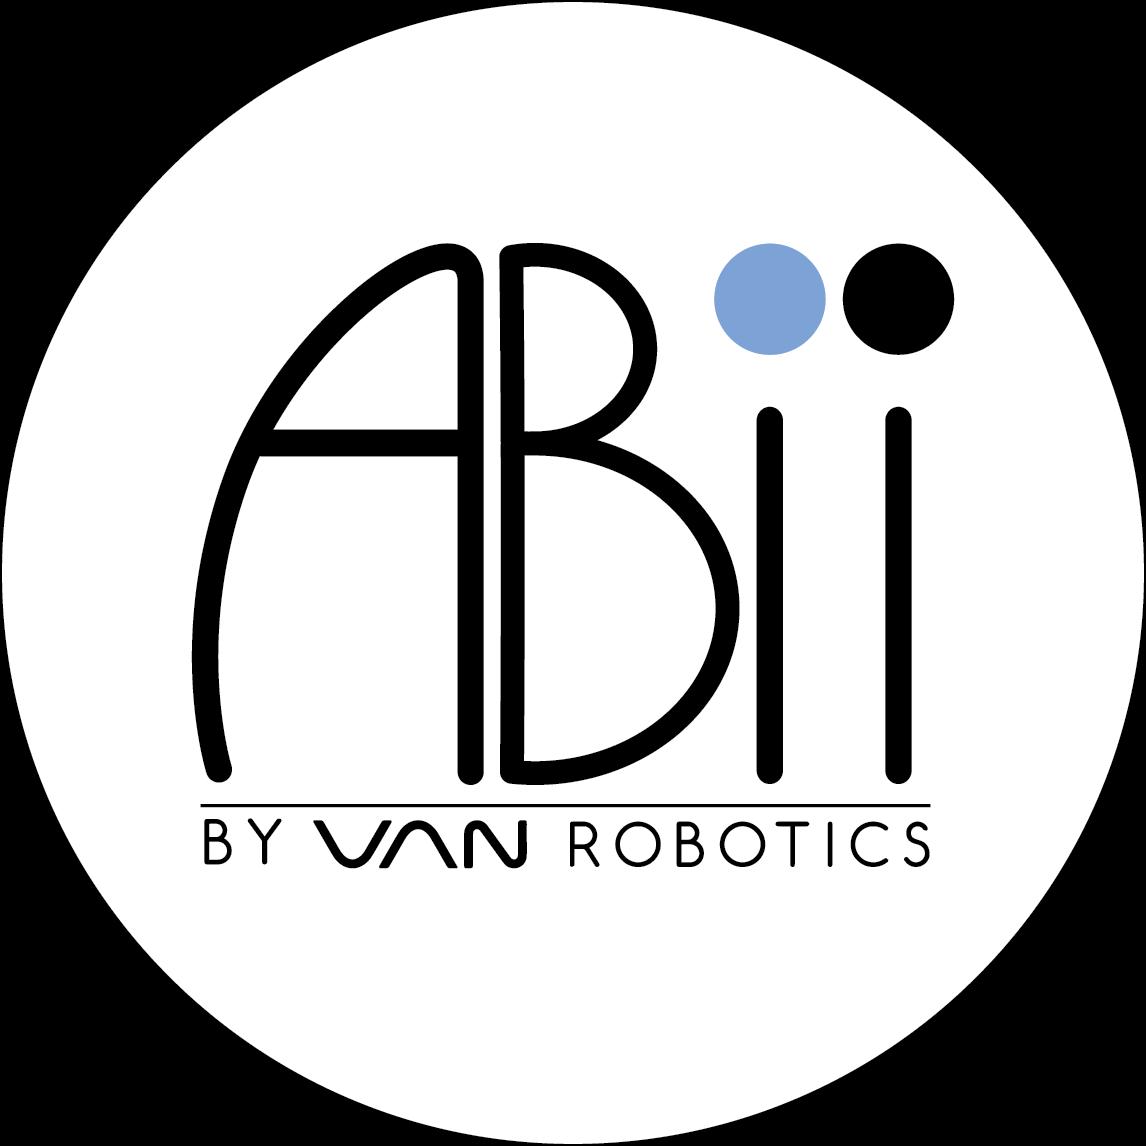 van-e bináris robot)